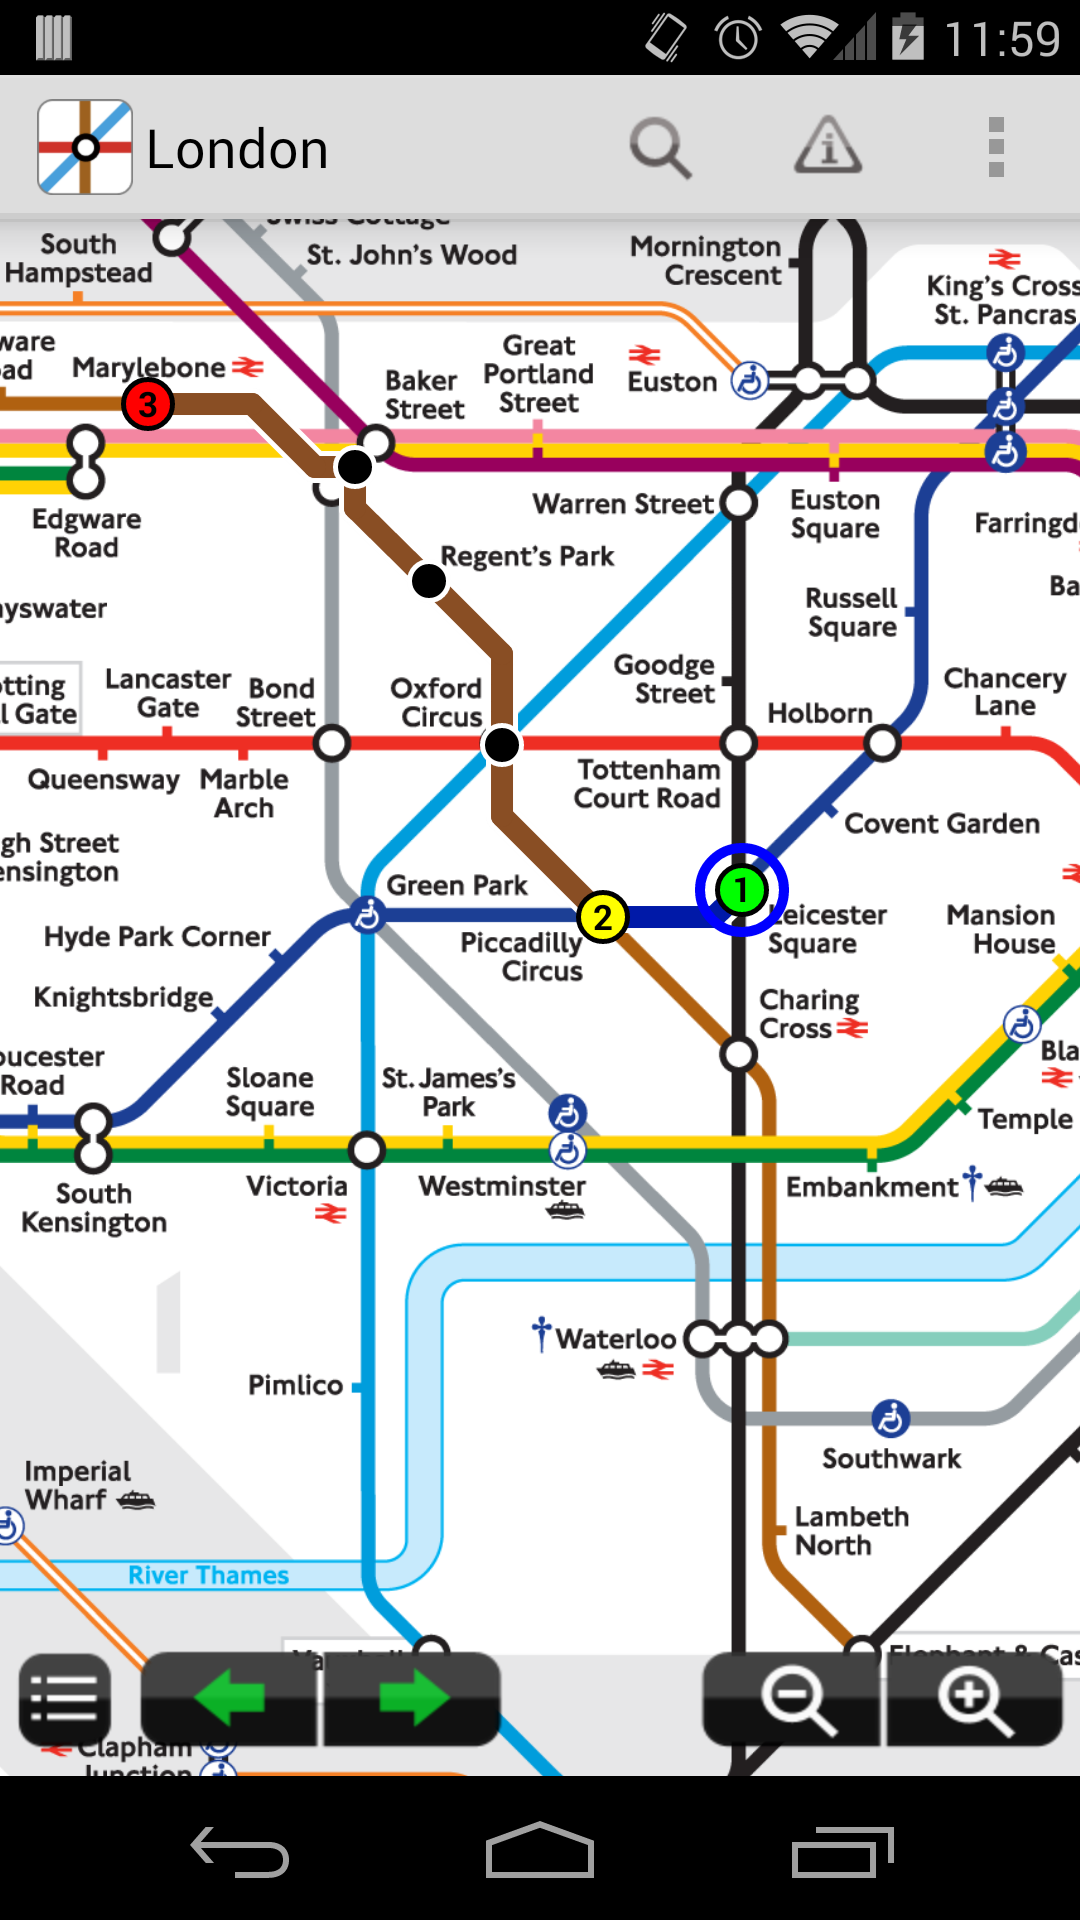 Kuala Lumpur Subway Map Pdf.Tube Map London Underground